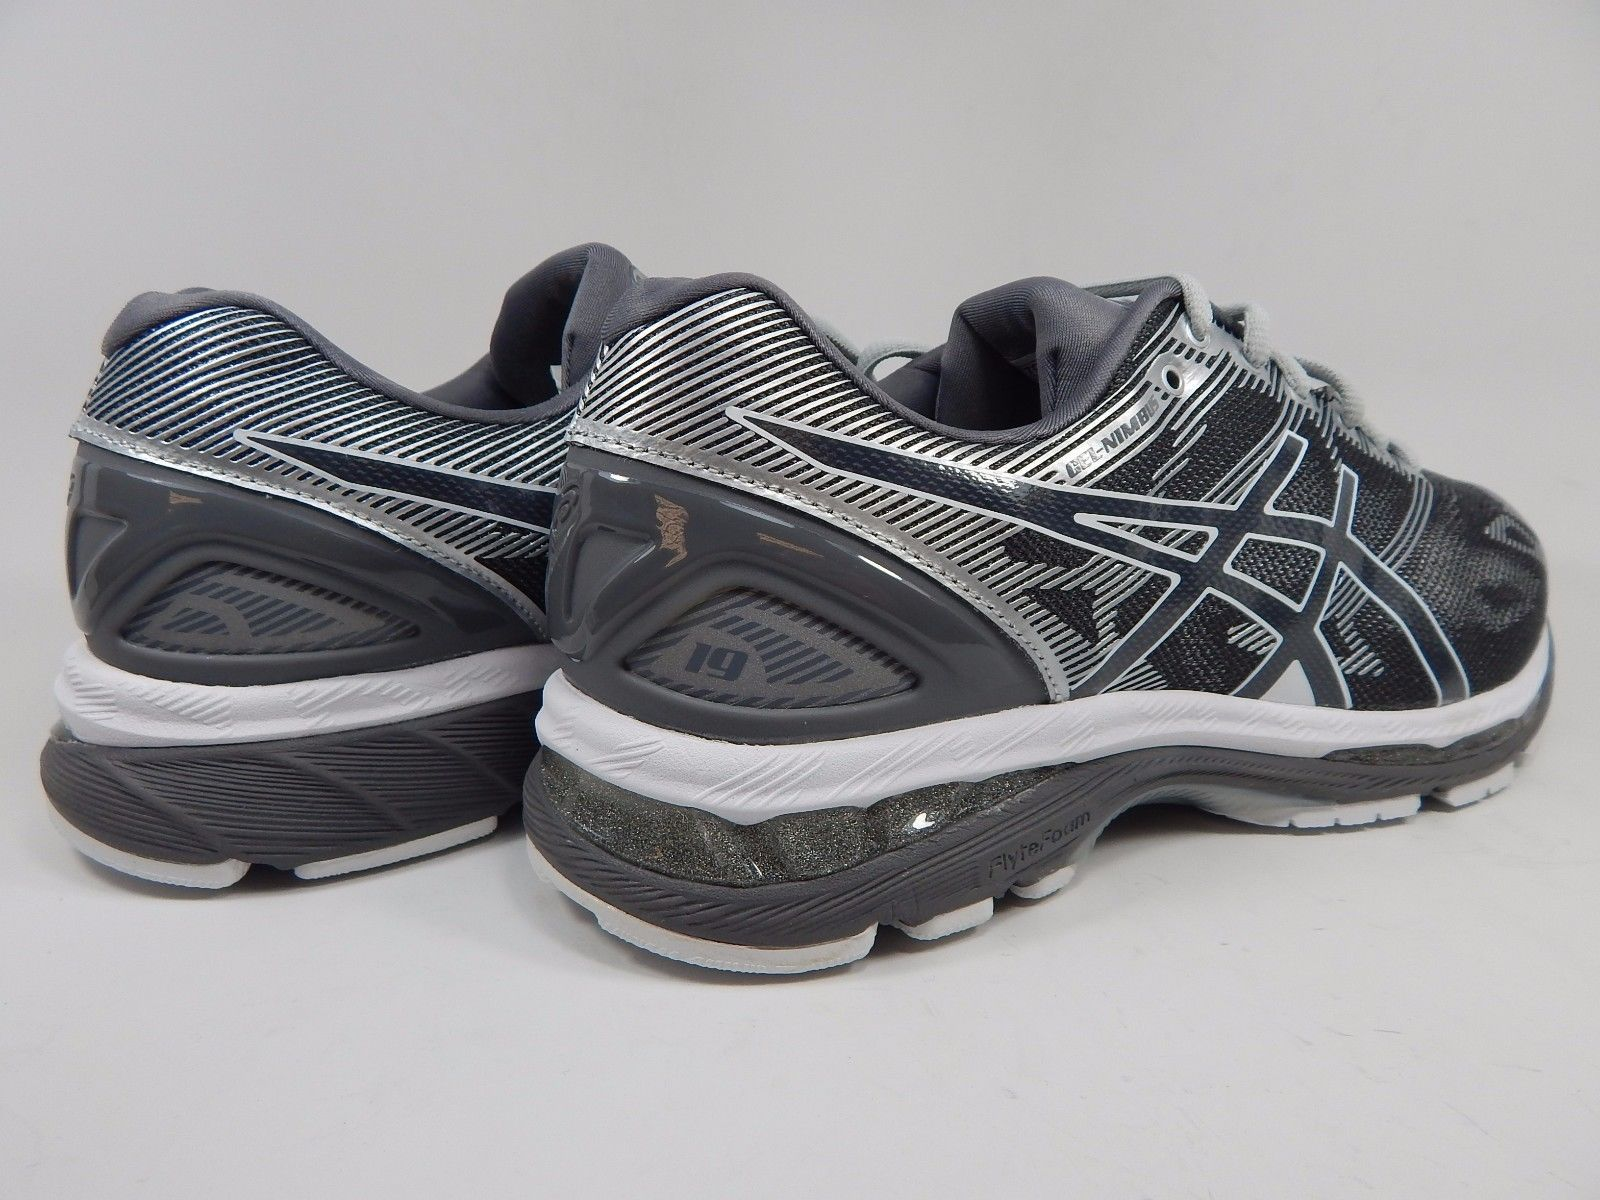 Do Asics Running Shoes Run Small